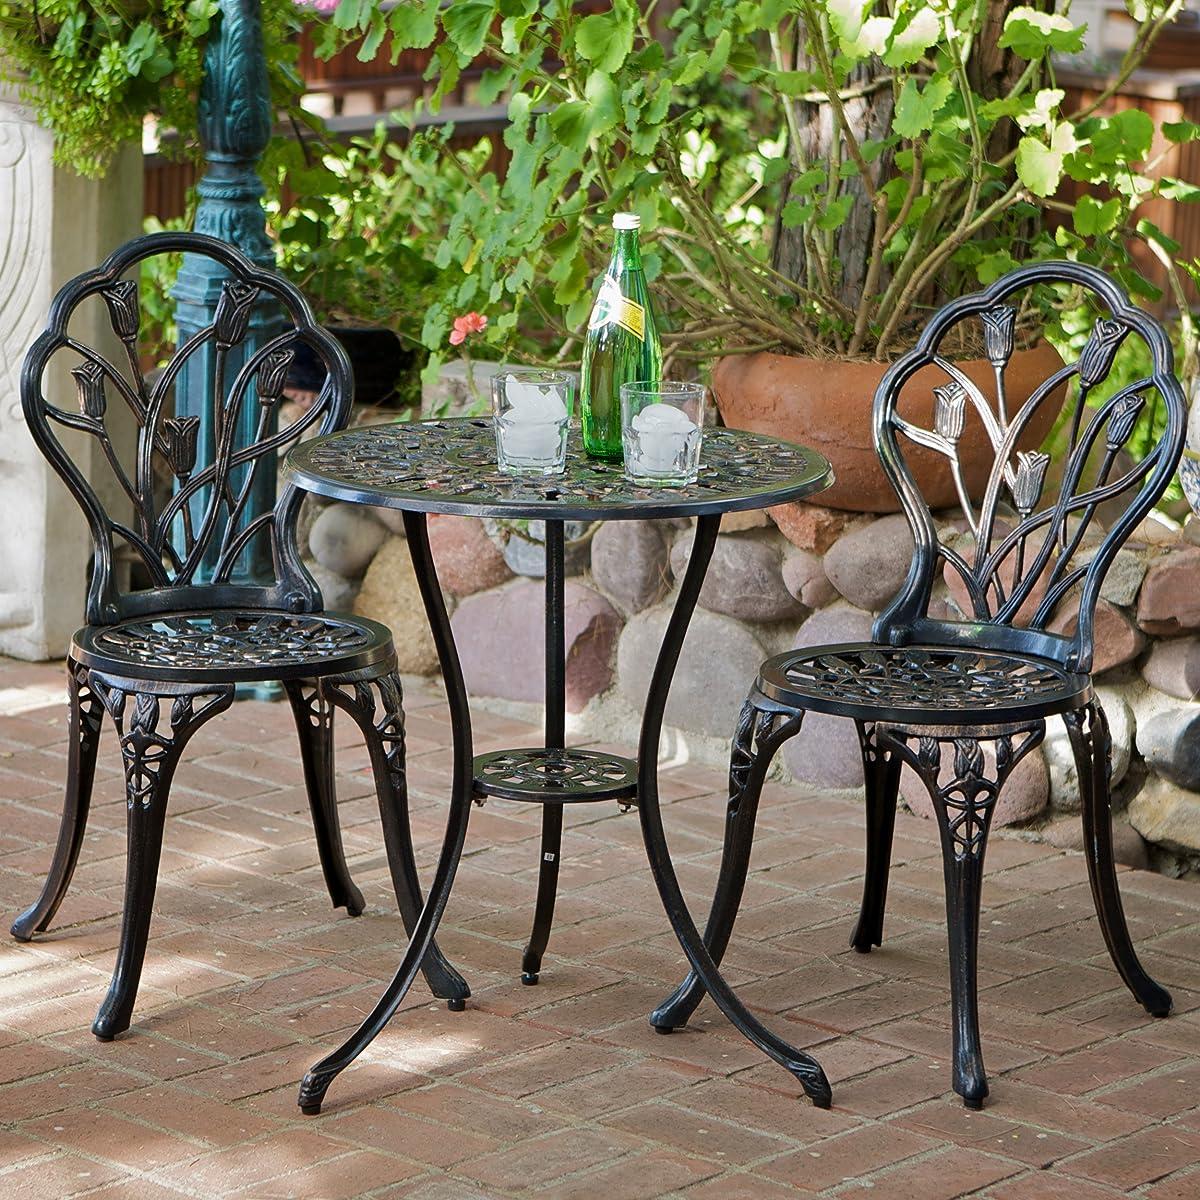 Best Selling Nassau Cast Aluminum Outdoor Bistro Furniture Set, Brown